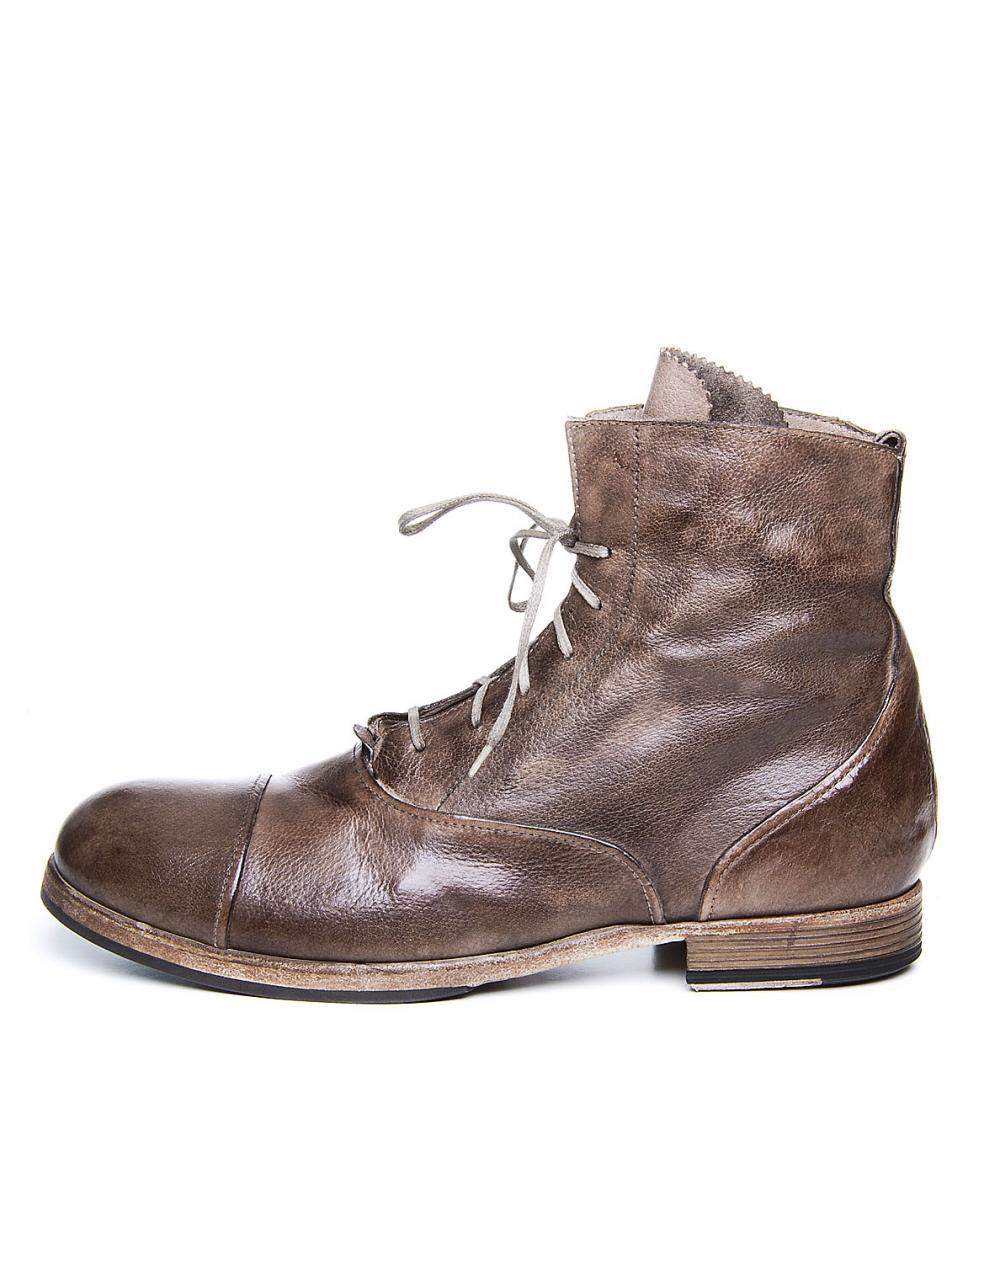 Boot GOL G02